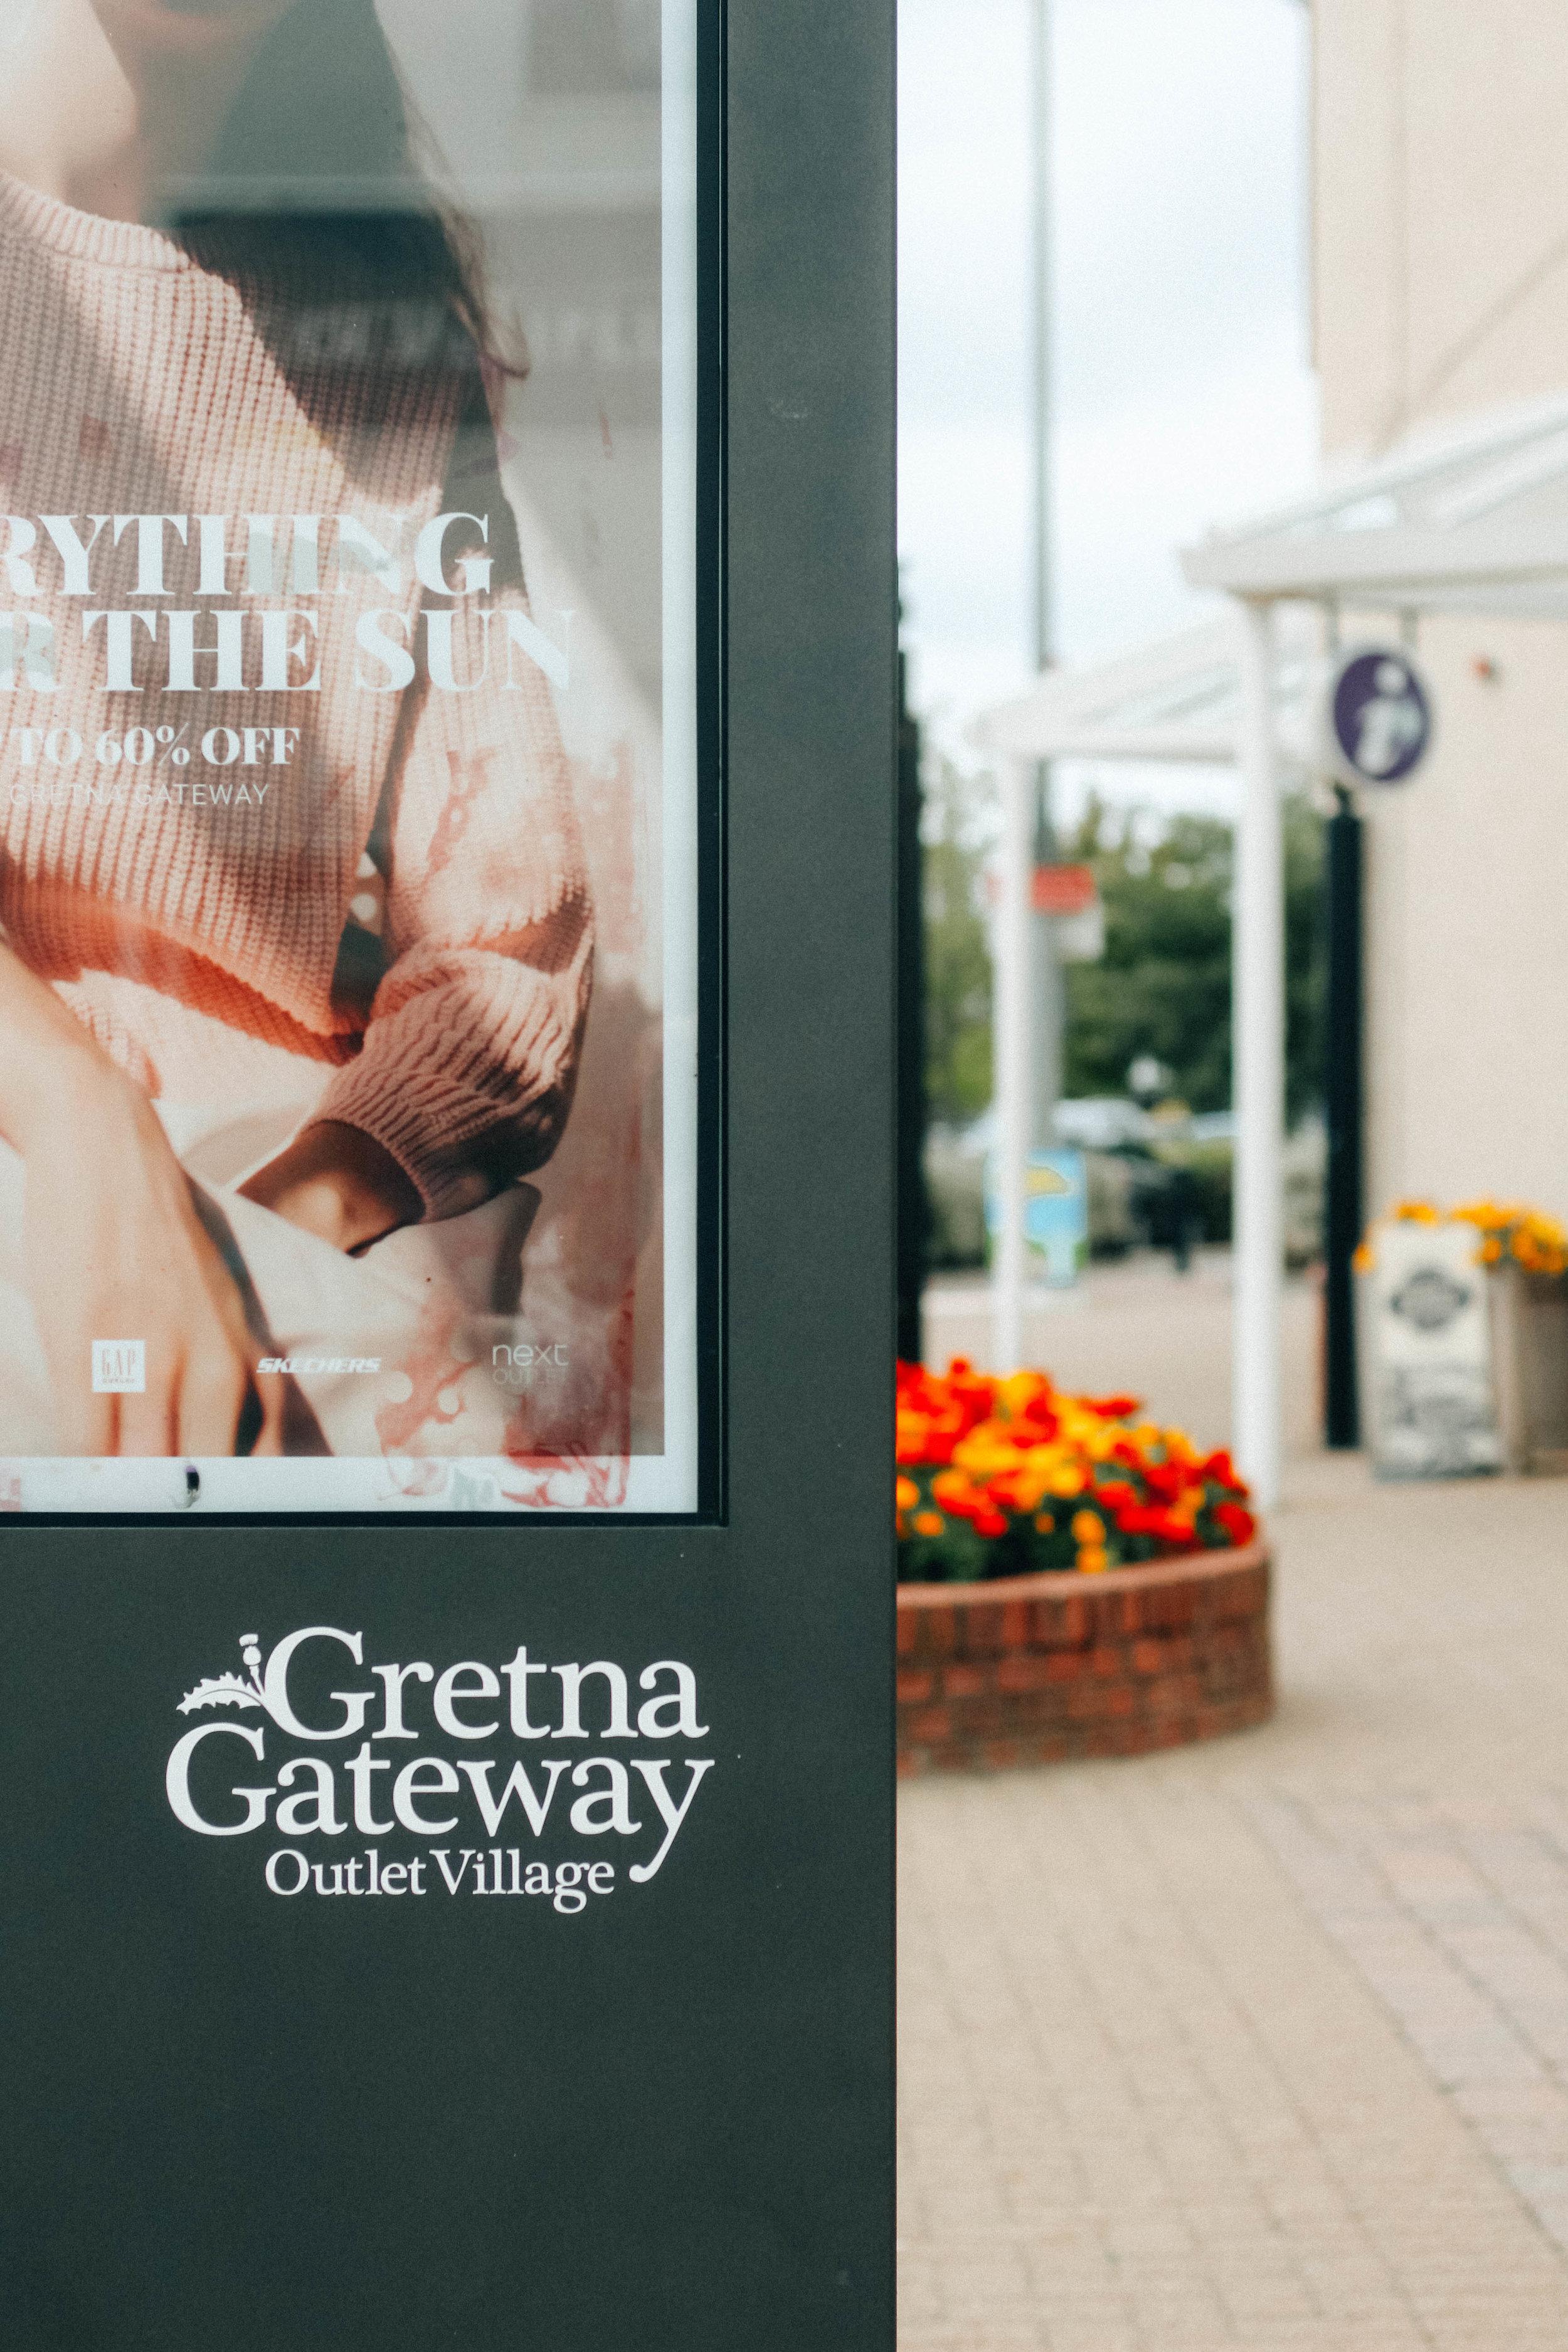 gretna gateway designer discount blog review Scotland